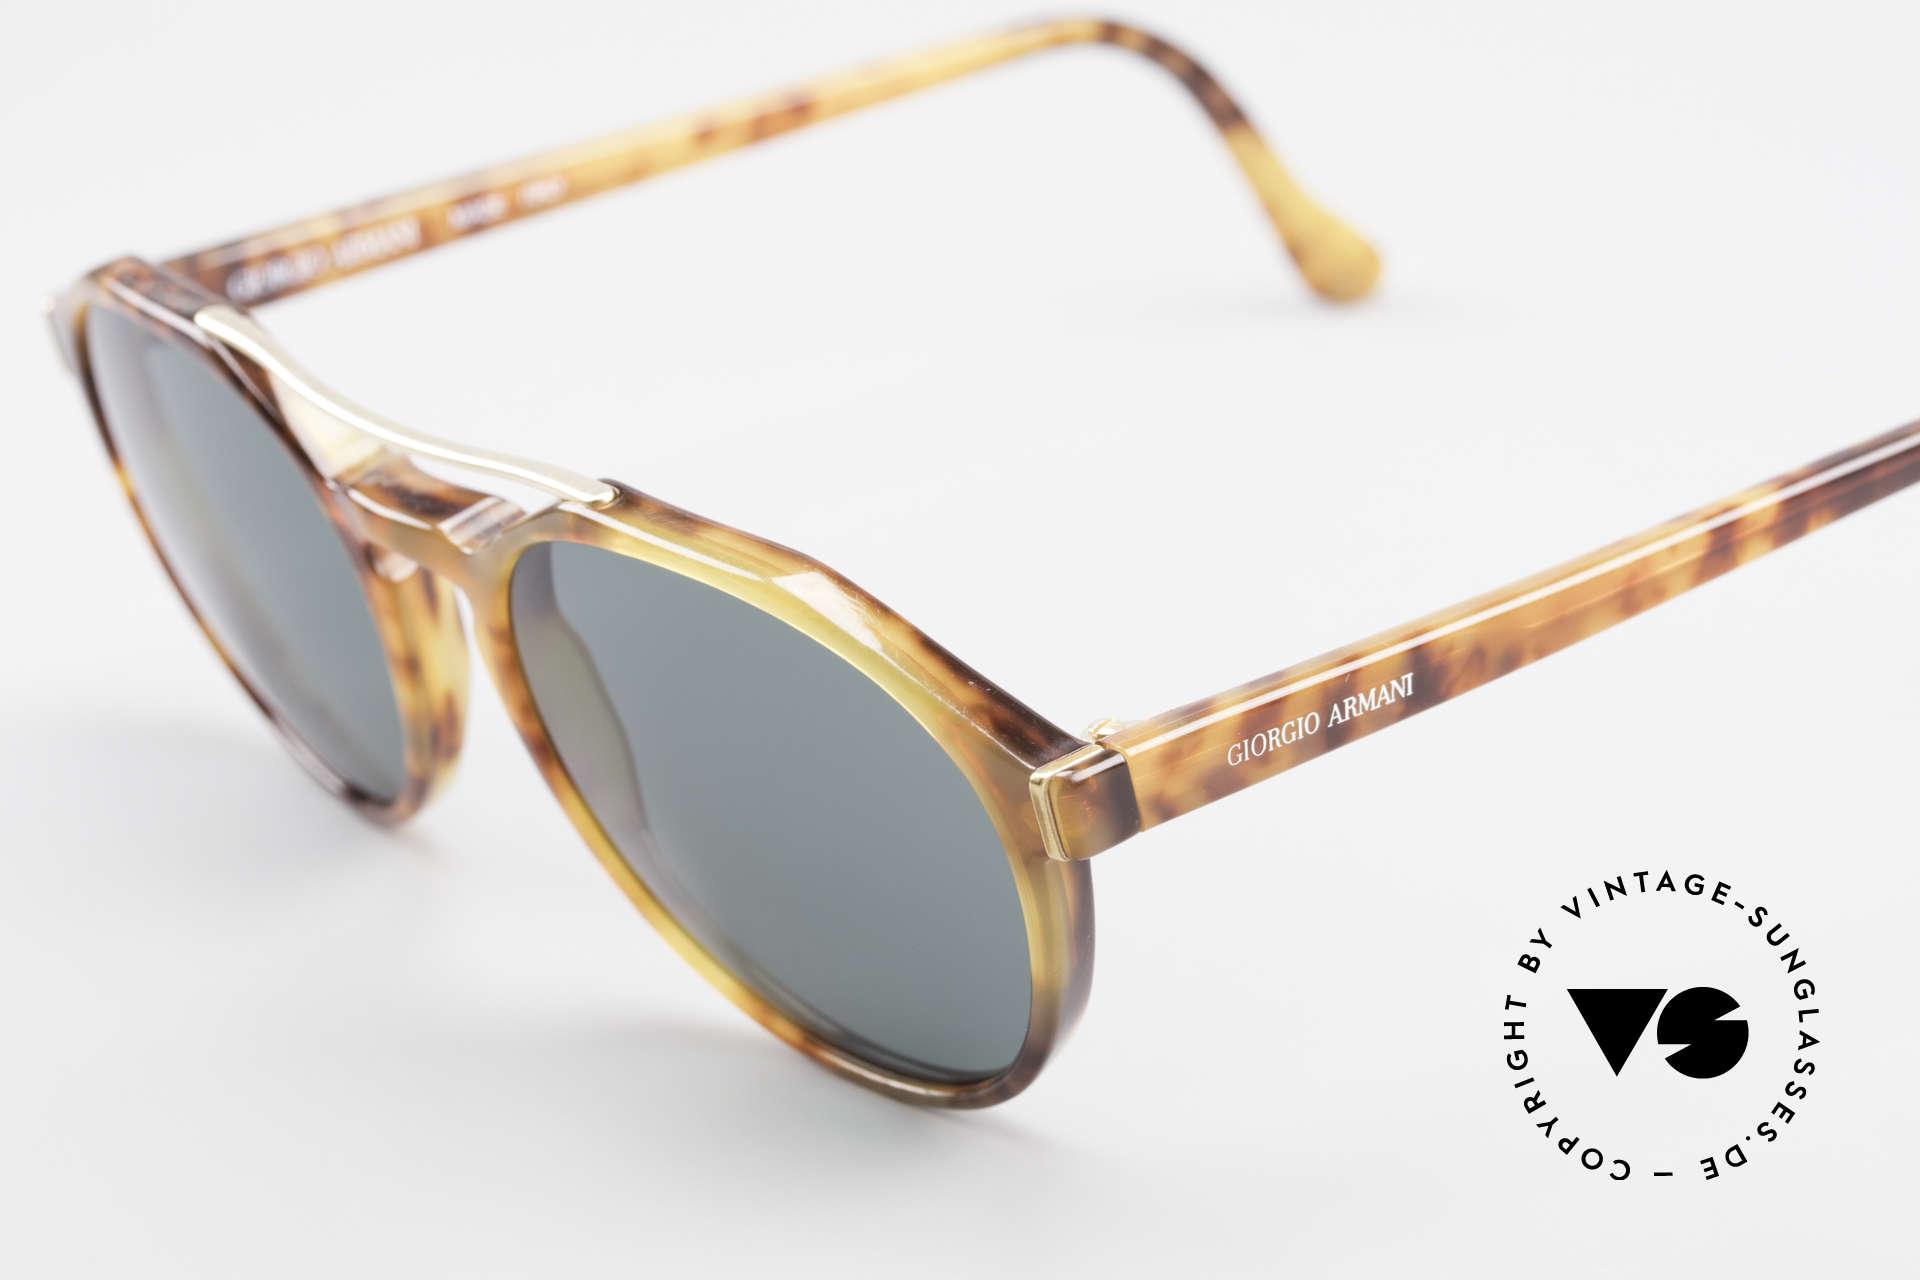 Giorgio Armani 311 Round Aviator 80s Sunglasses, never worn (like all our classic GIORGIO Armani shades), Made for Men and Women